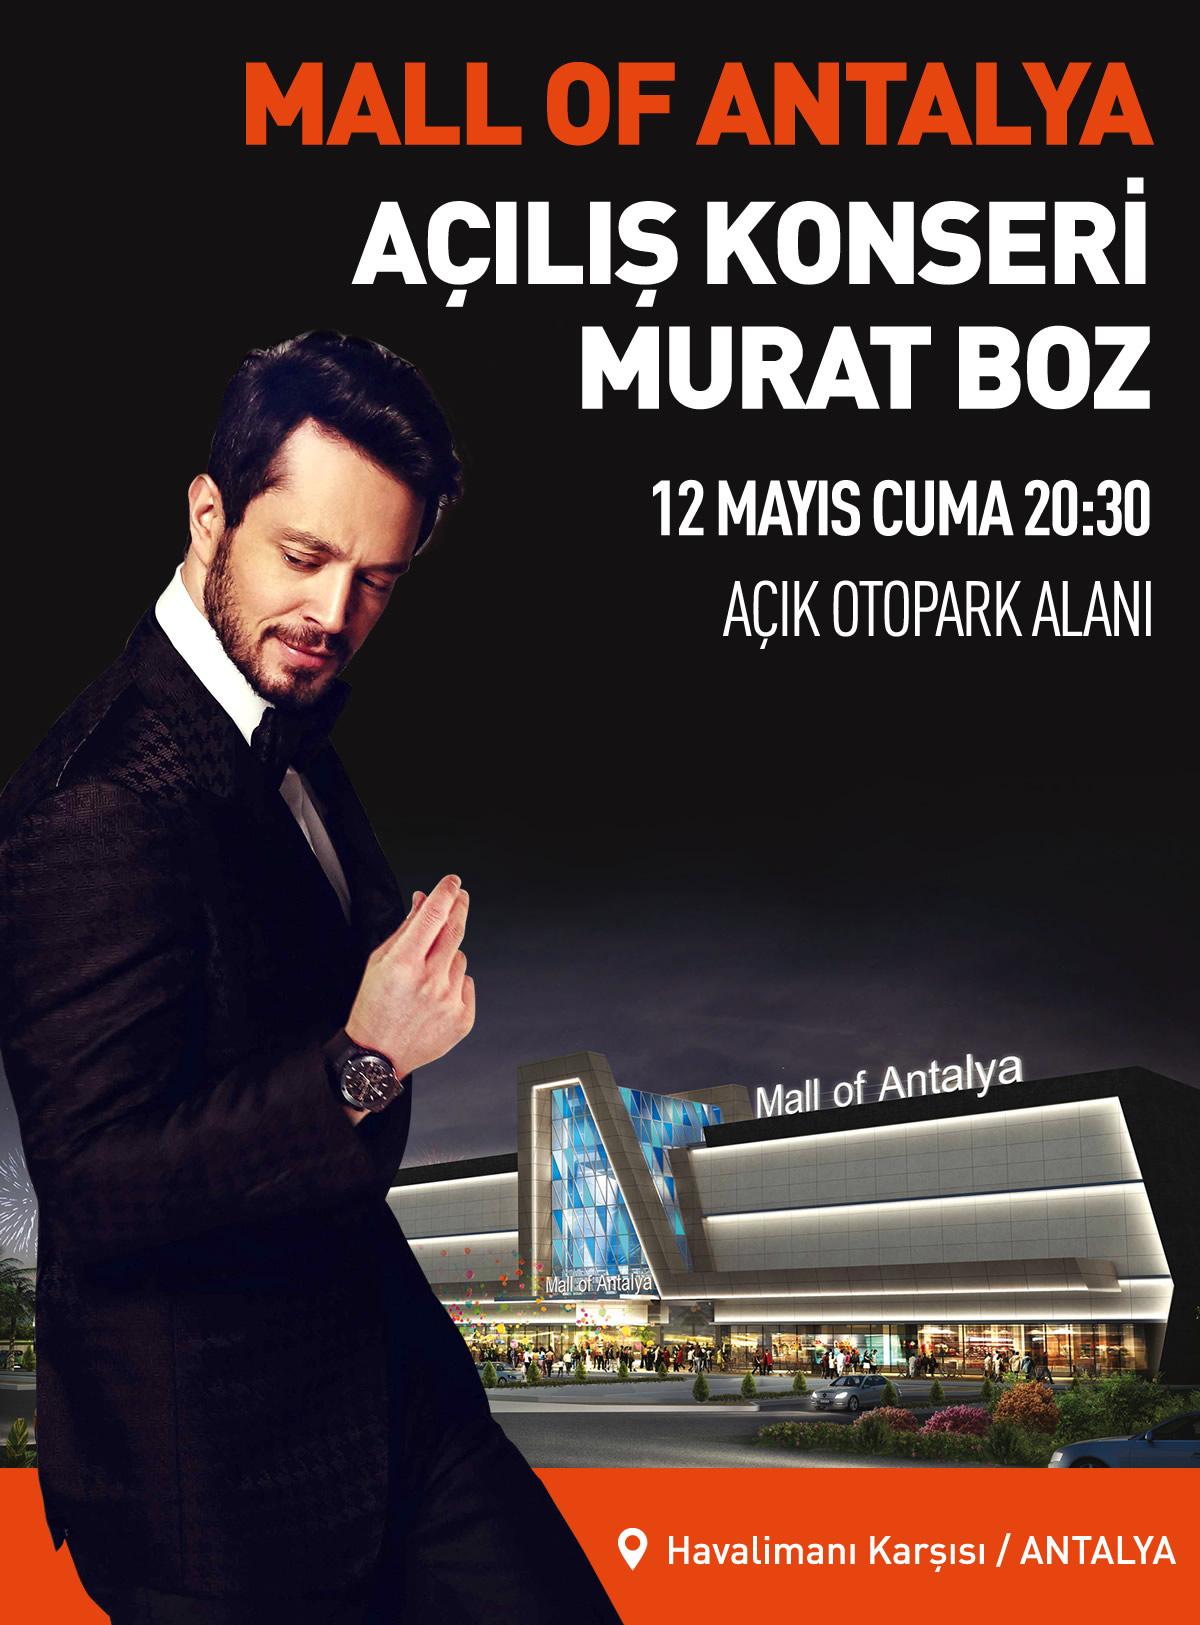 Mall Of Antalya Açılış Konseri Murat Boz